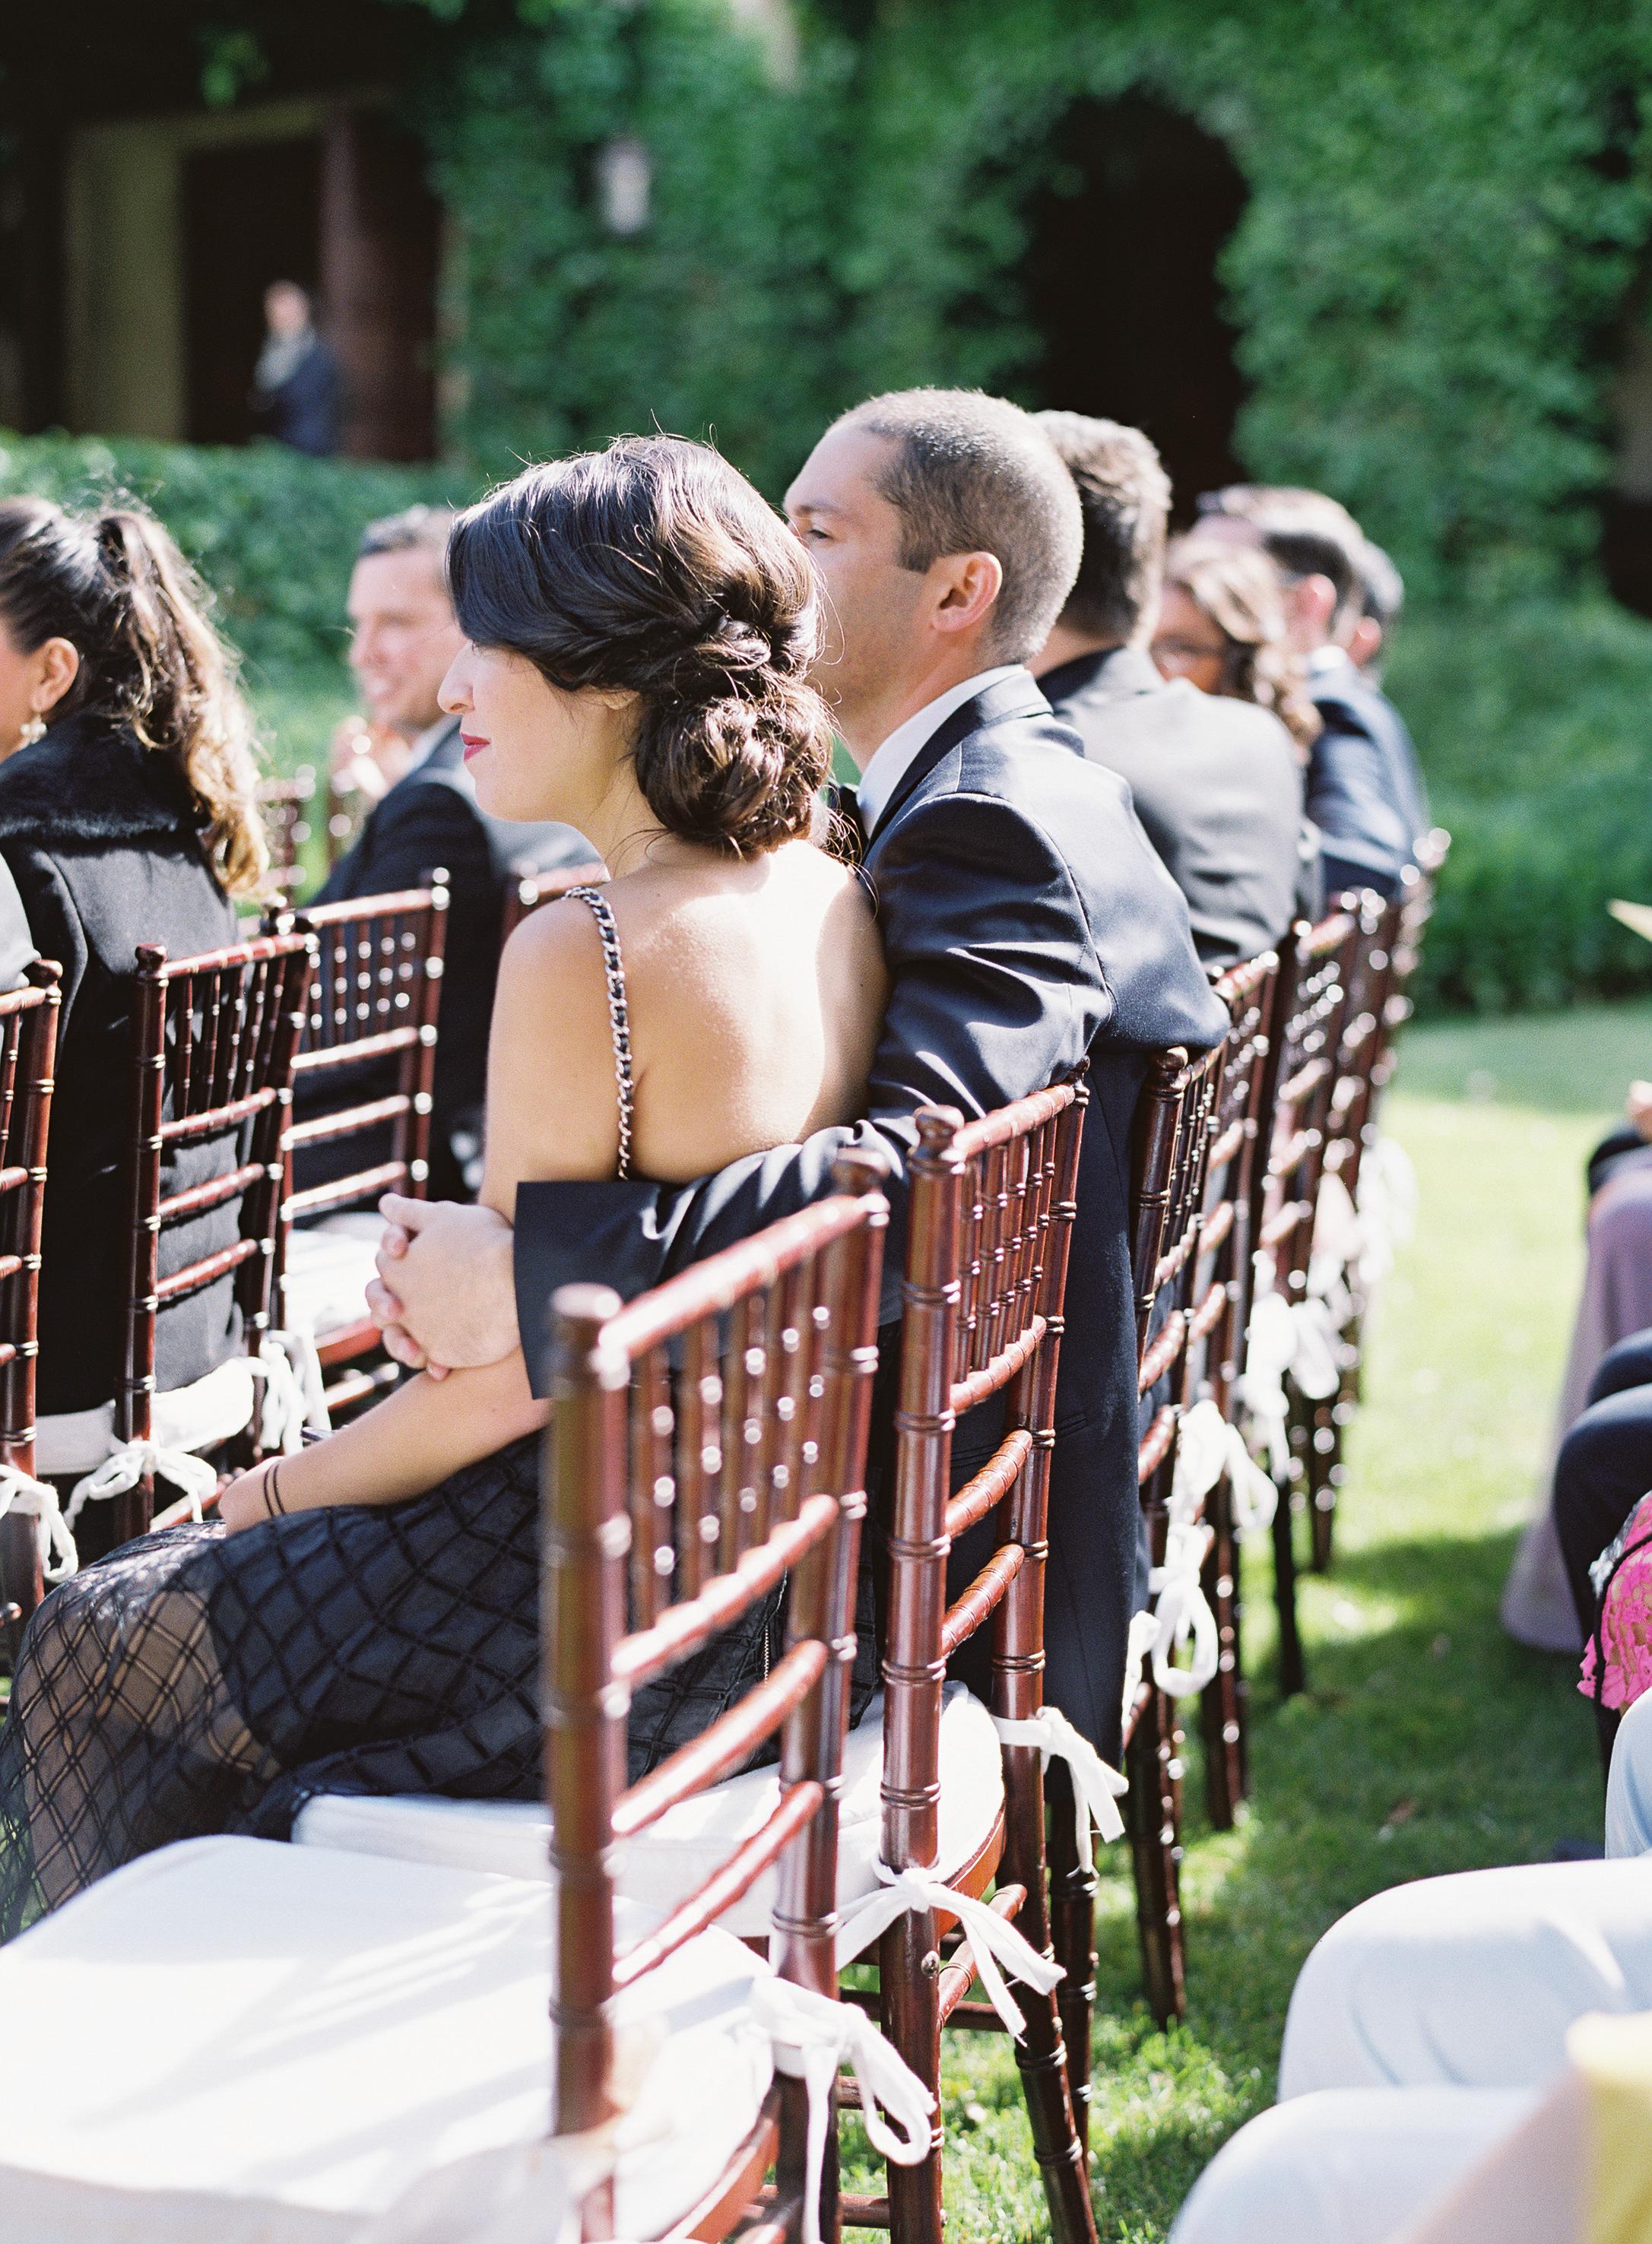 Meghan Mehan Photography   Fine Art Film Wedding Photographer   California   San Francisco   Napa   Sonoma   Santa Barbara   Big Sur   Destination Wedding Photographer 121.jpg